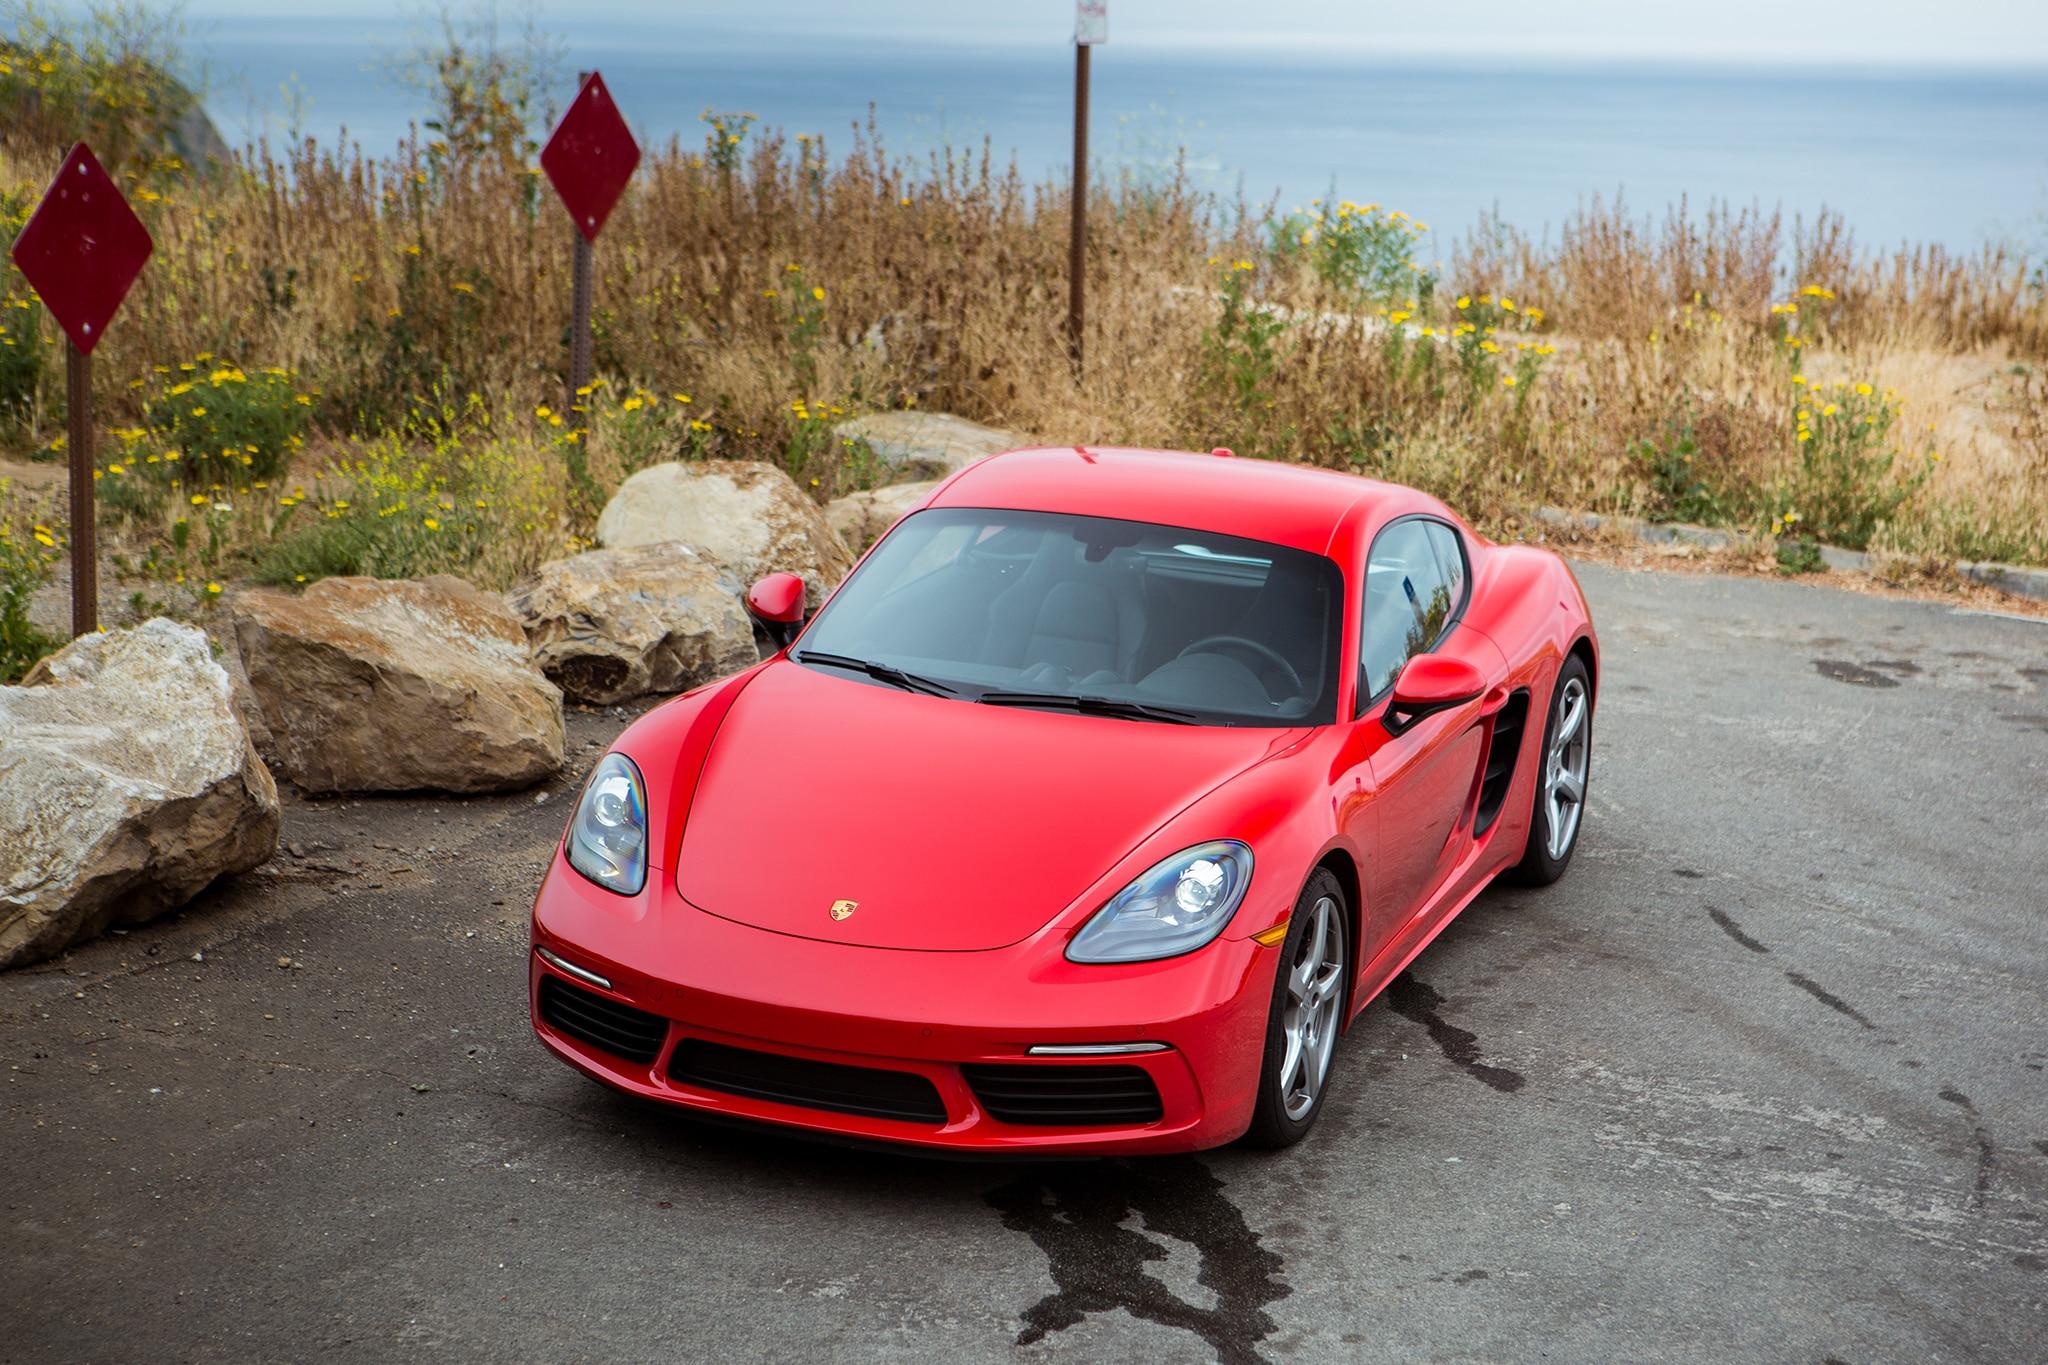 2019 Porsche 718 Cayman Review: Entry-Level Can Still Kick ...